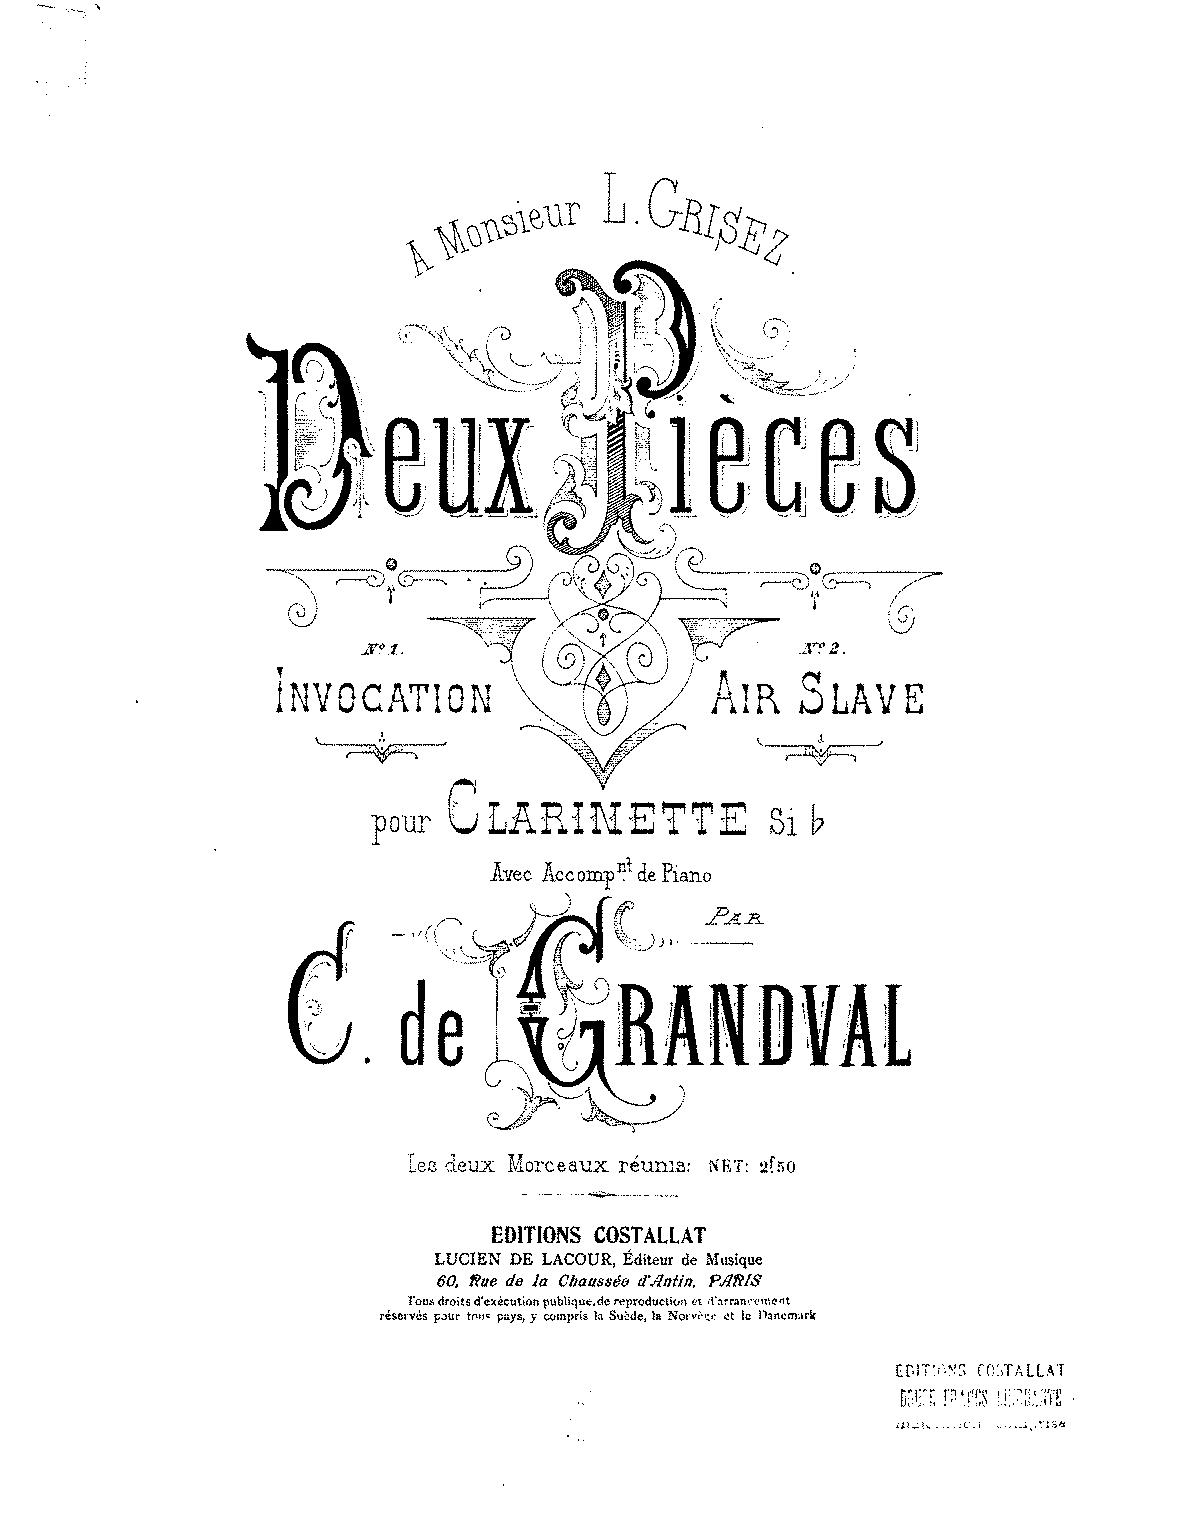 2 Pieces for Clarinet and Piano (Grandval, Clémence de